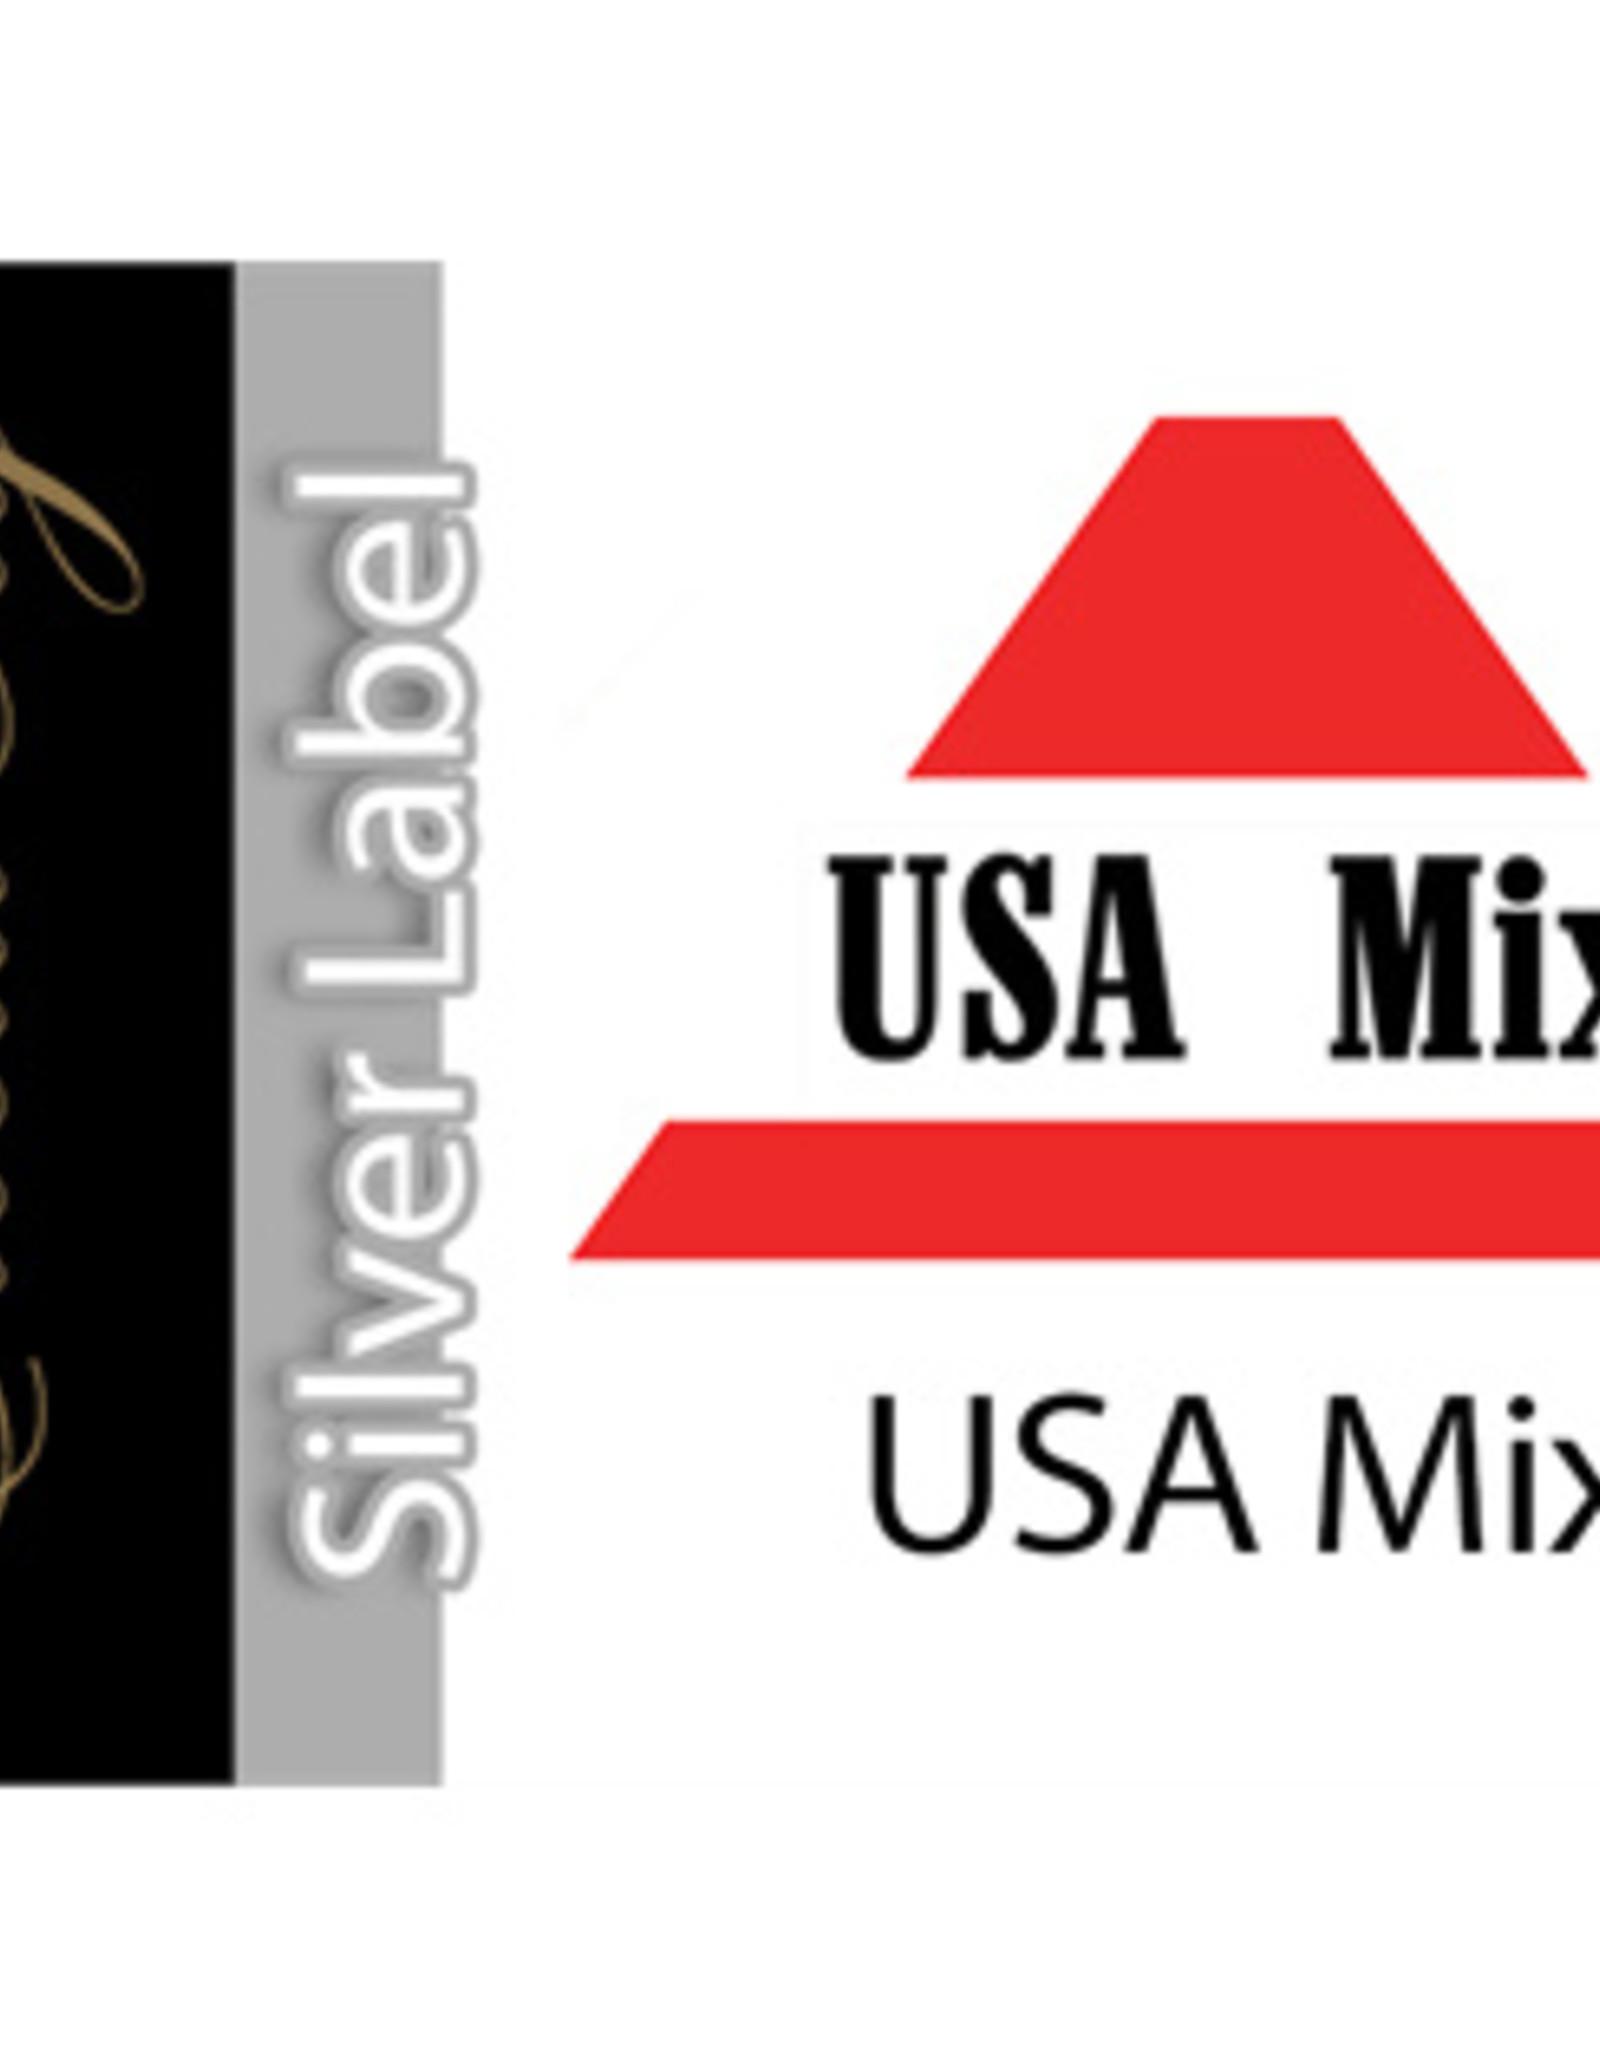 Exclucig Exclucig Silver Label E-liquid USA Mix 18 mg Nicotine